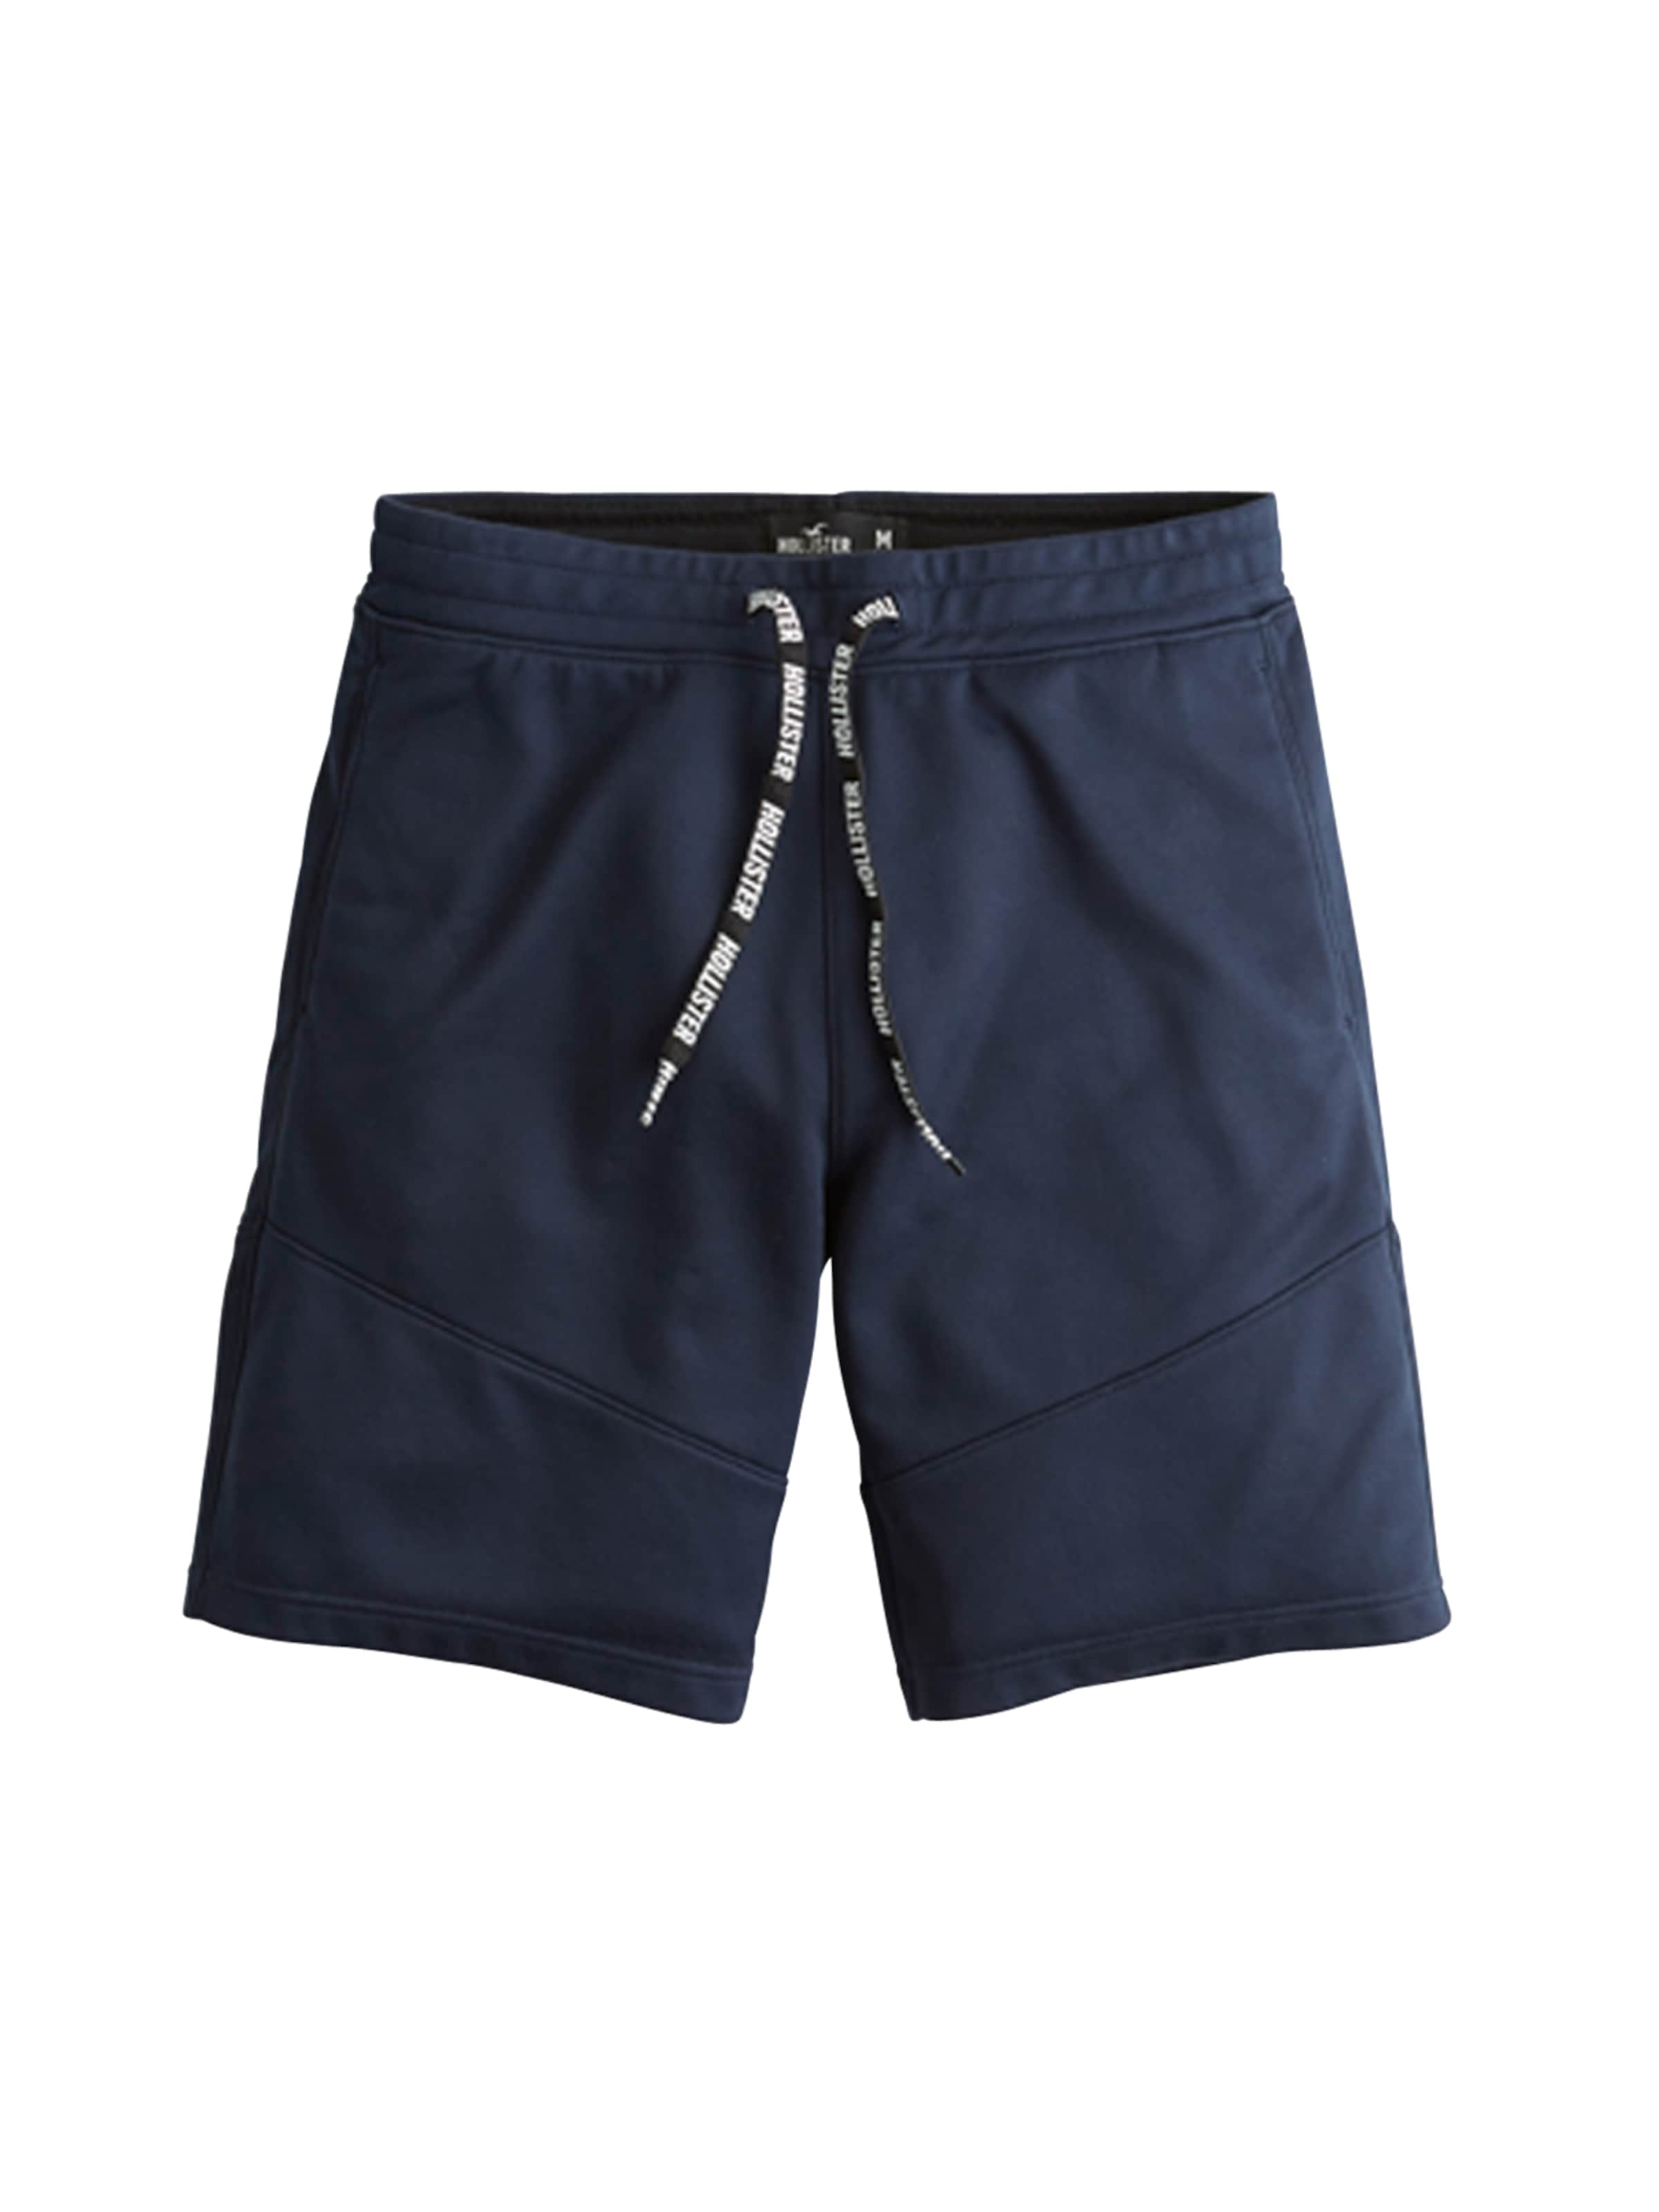 Pantalon 'tricot Piping' En Hollister Bleu Marine CrBodxe